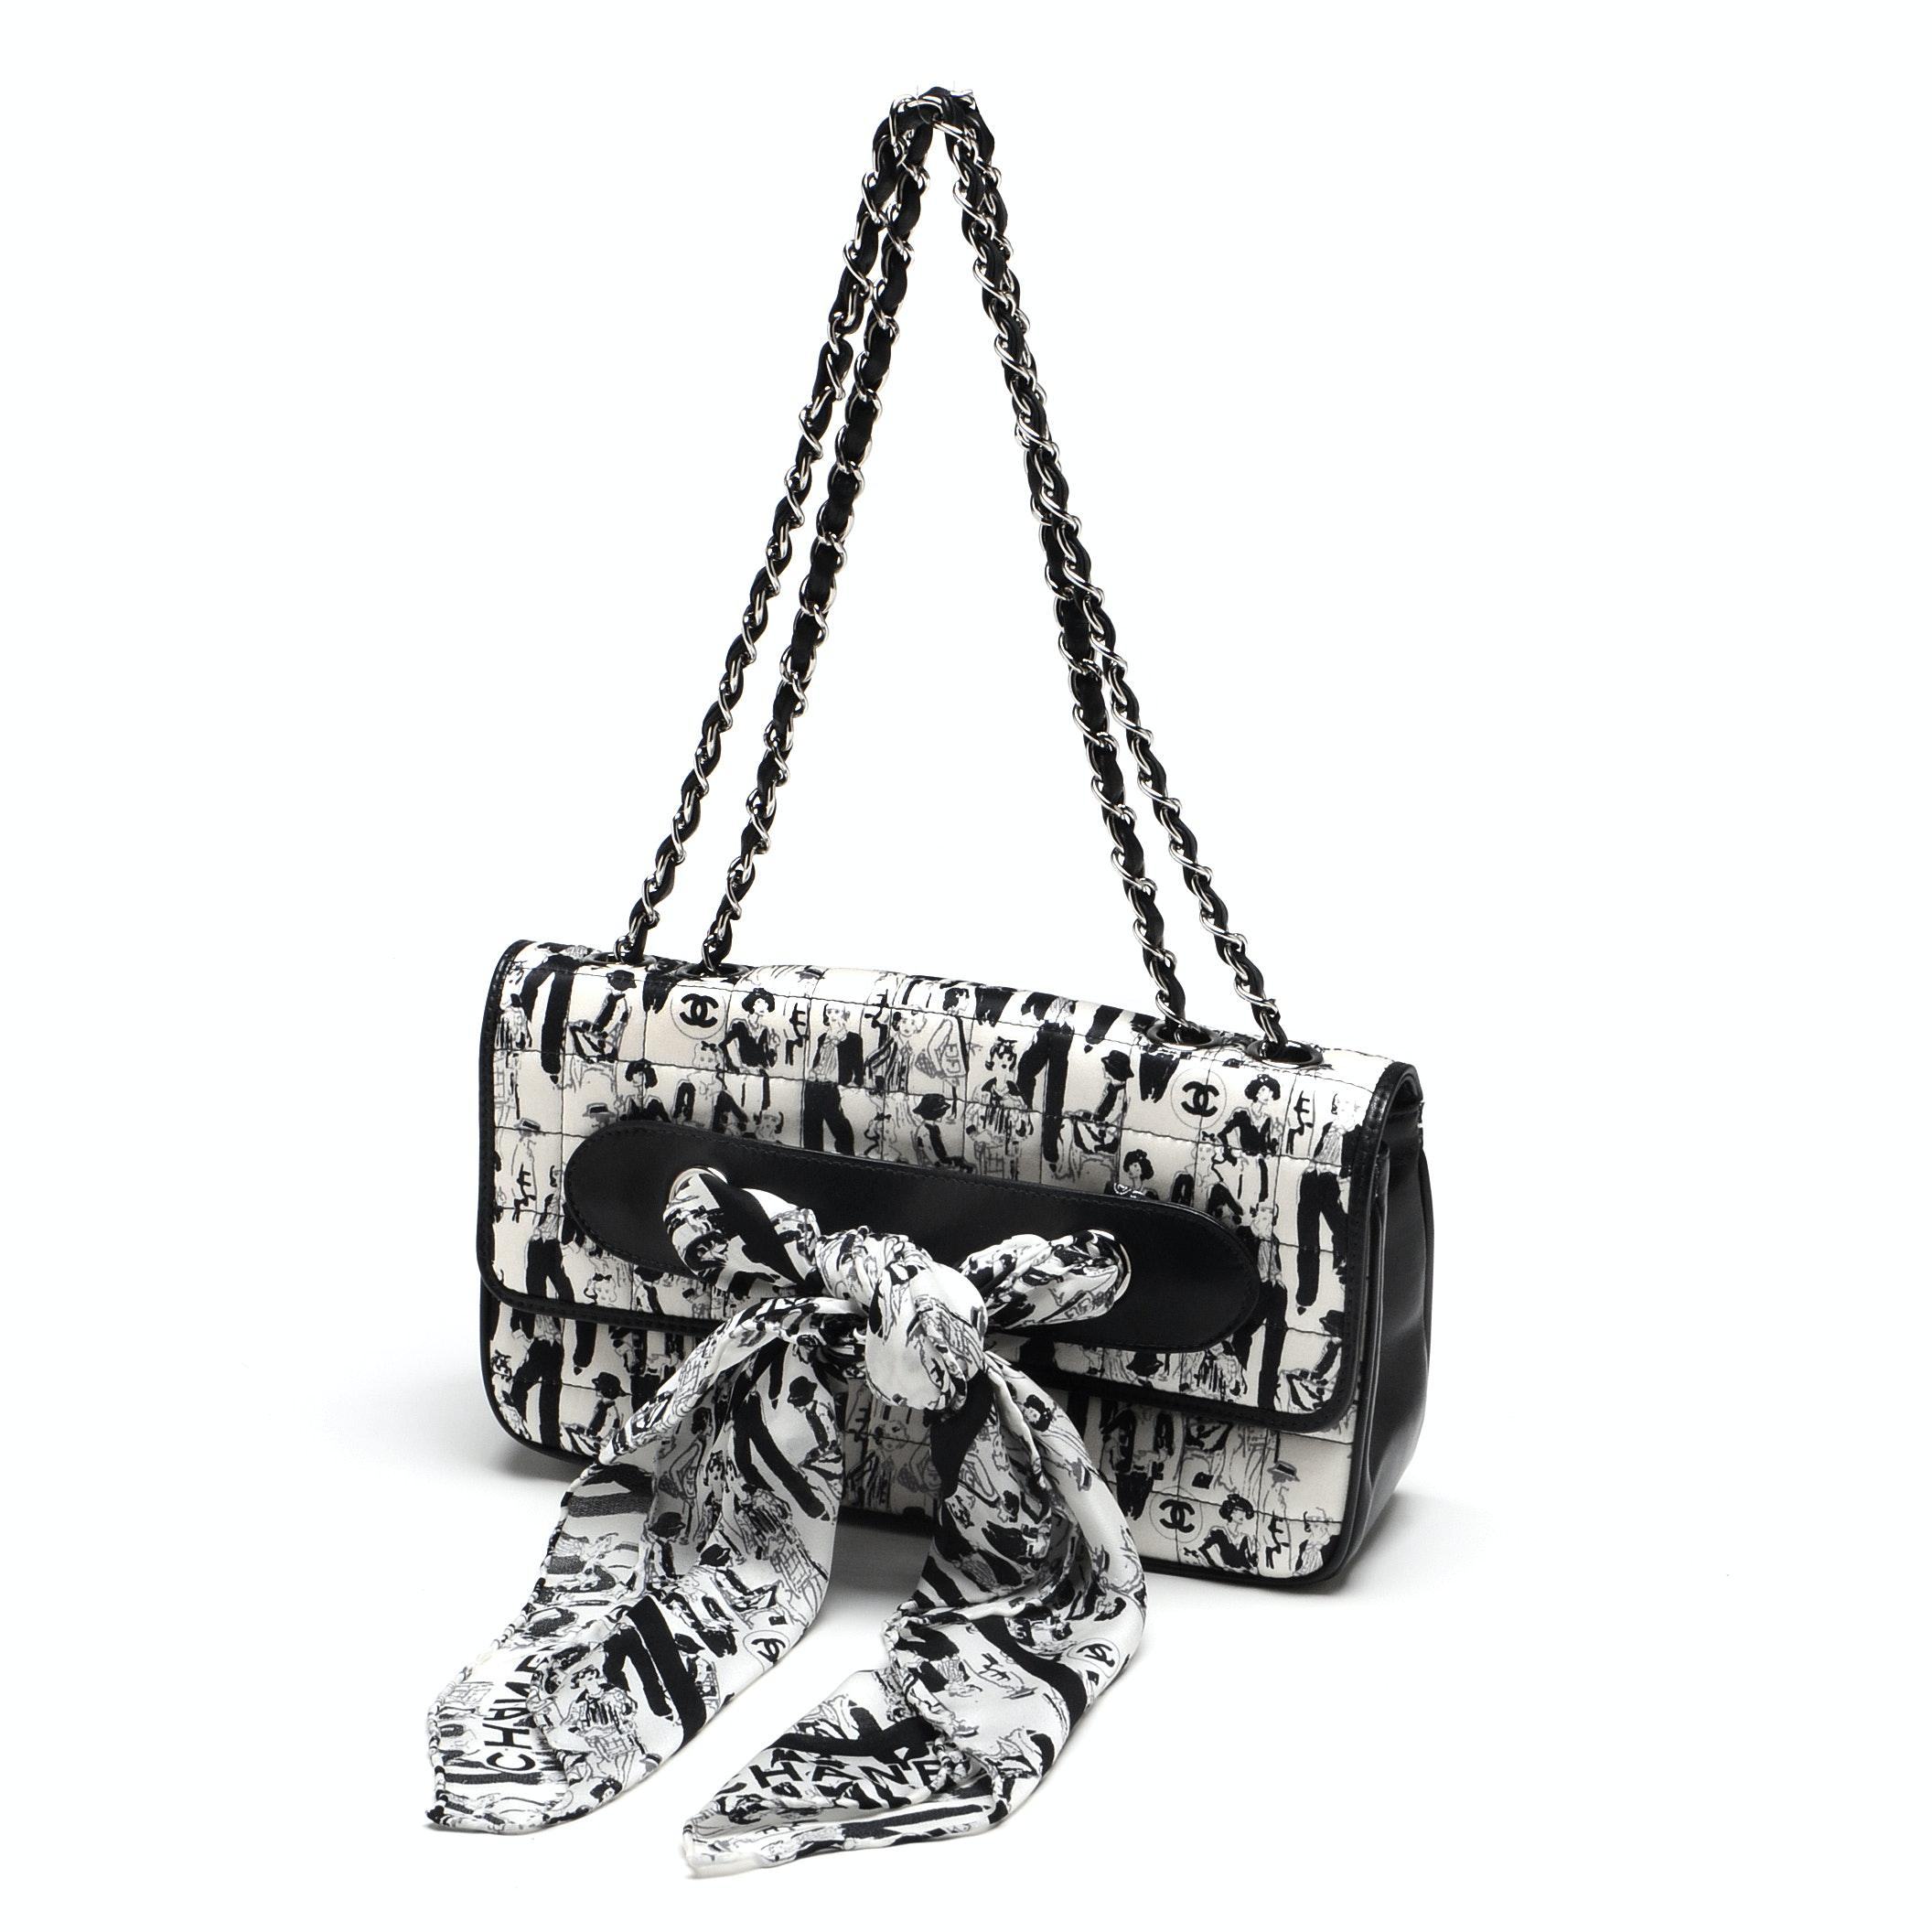 Chanel Black and White Silk Coco Mademoiselle Print Lambskin Leather Flapbag